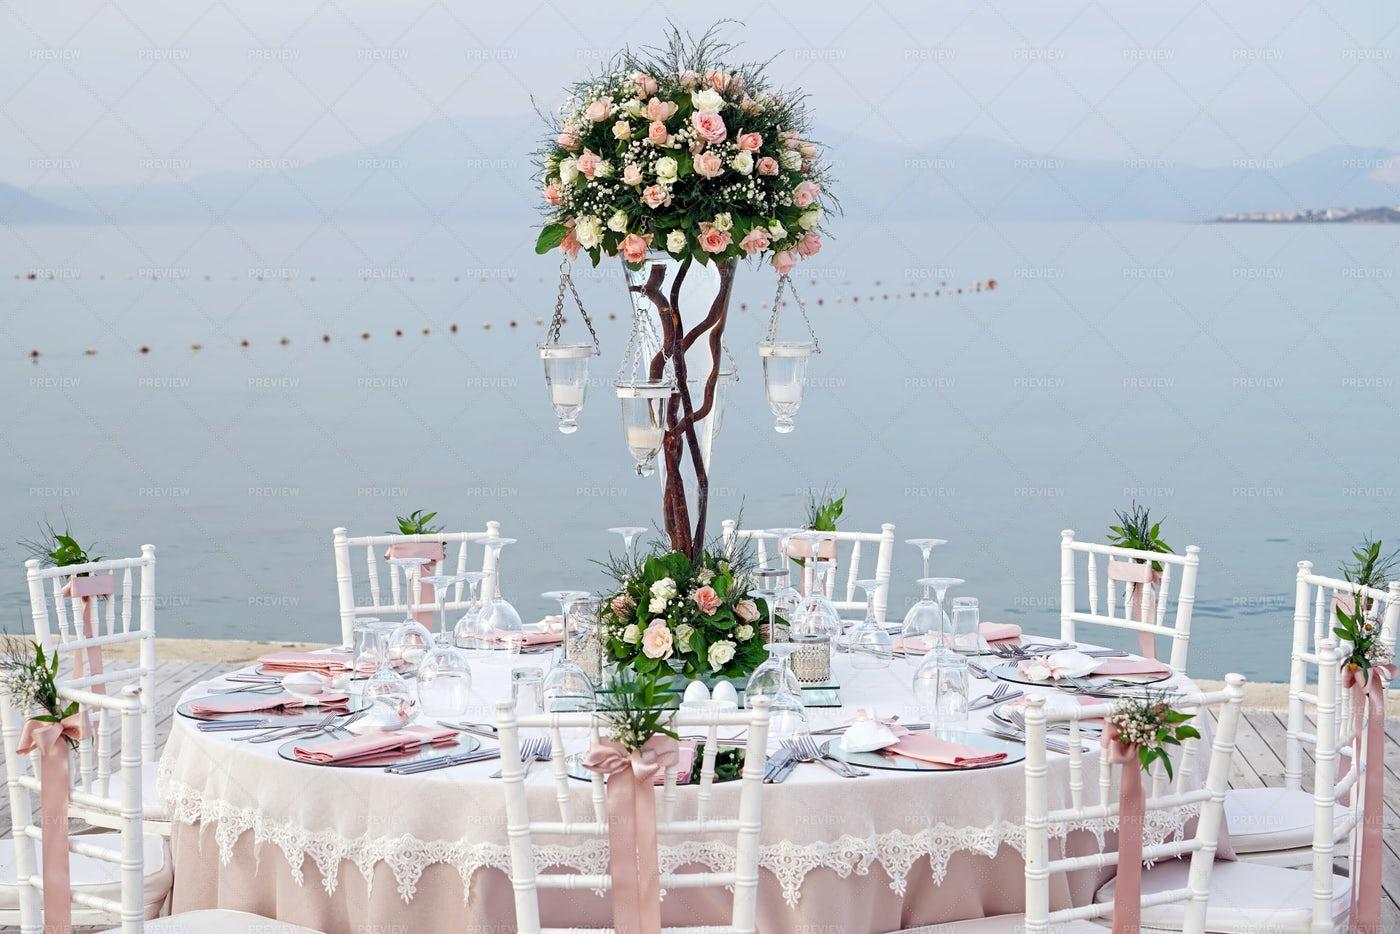 Beach Wedding Table: Stock Photos